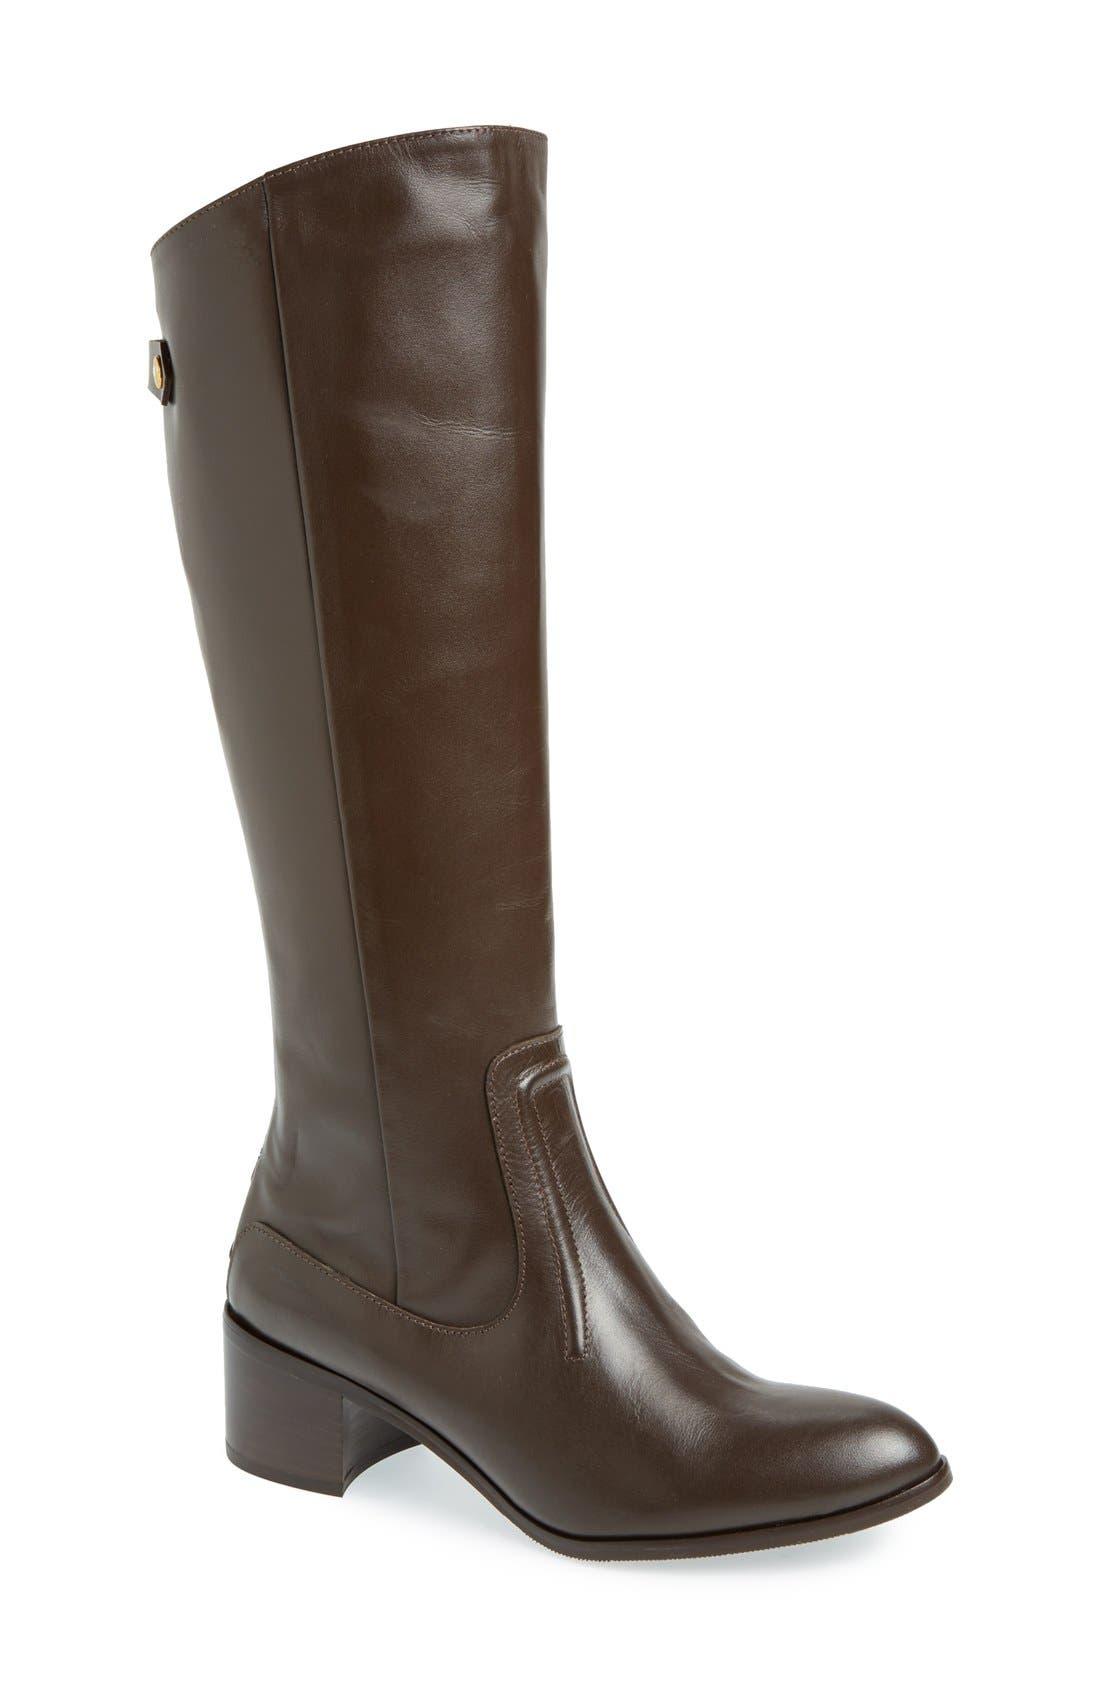 Main Image - Charles David 'Ramu' Leather Riding Boot (Women)